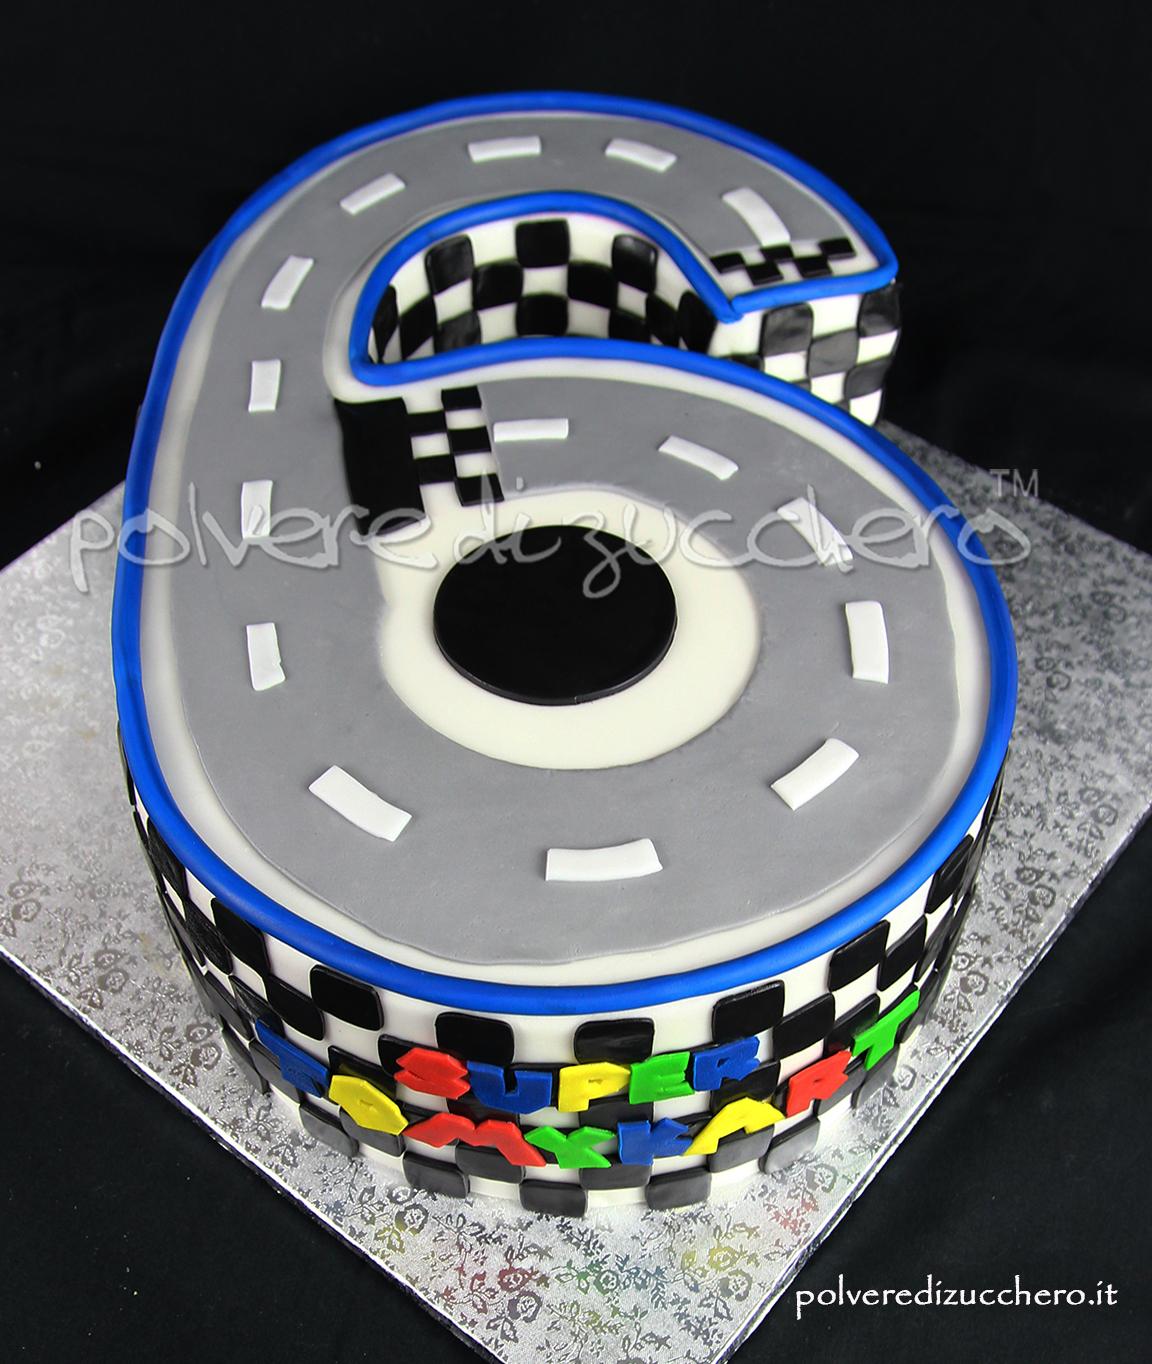 mario kart torta cake design pasta di zucchero torta a forma di numero 6 polvere di zucchero